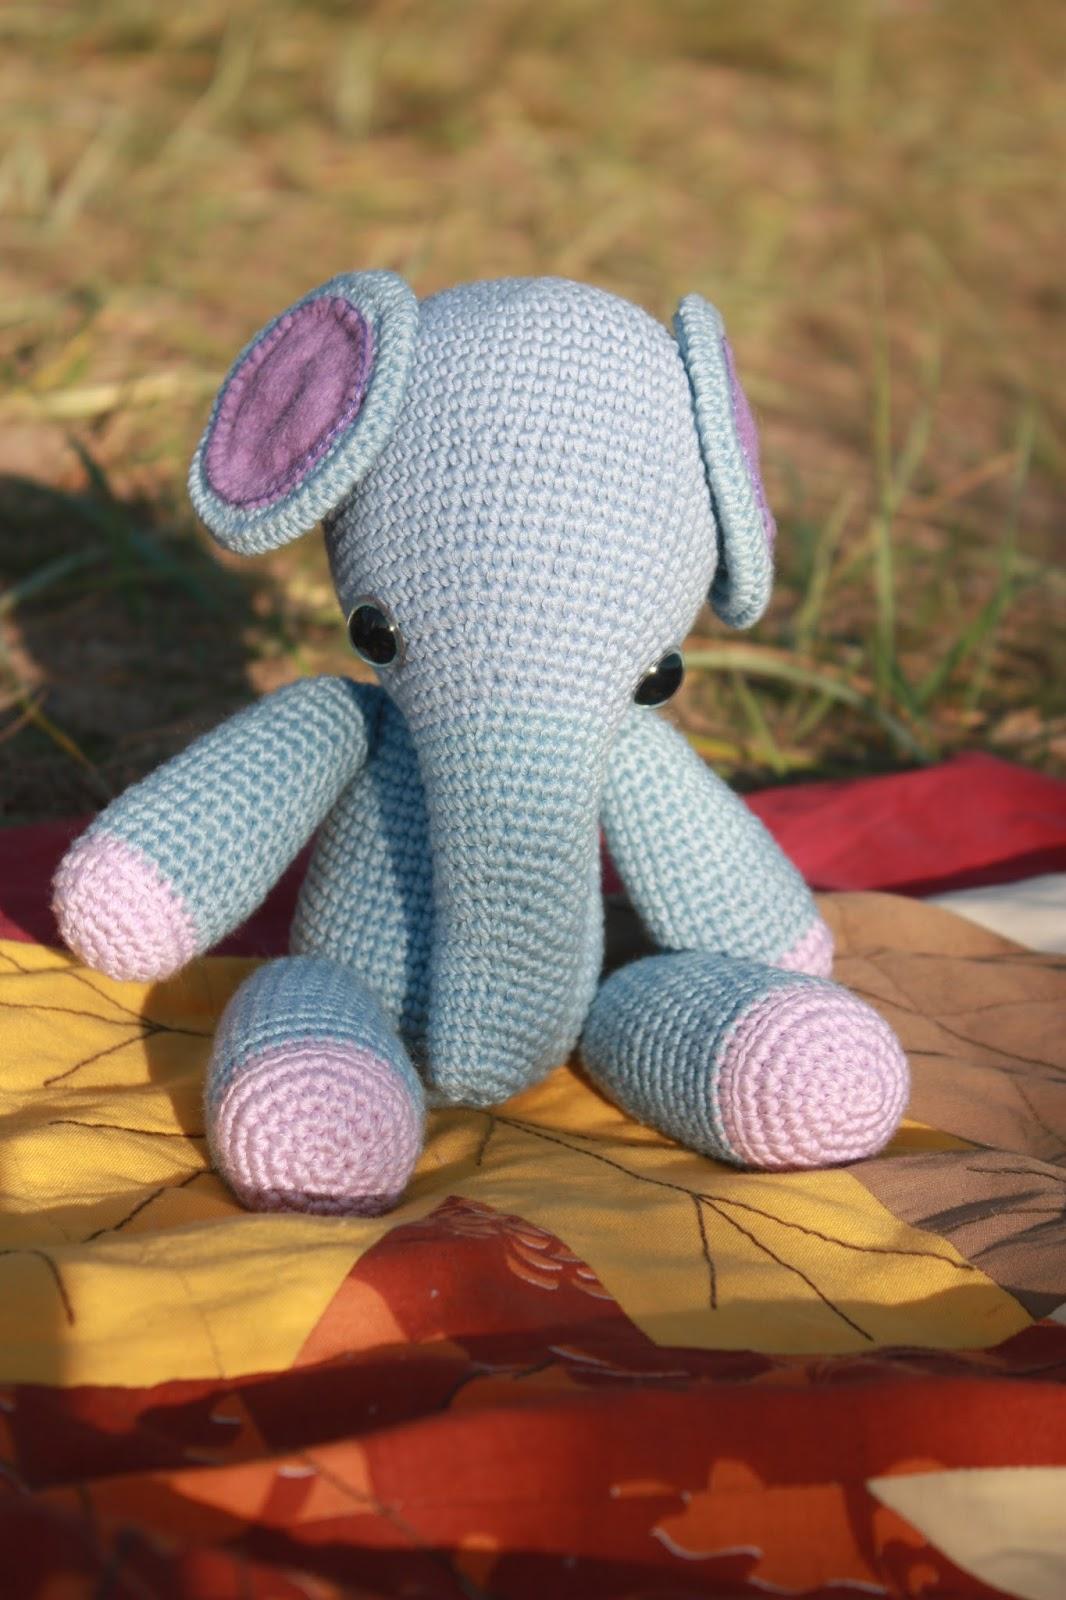 Pink crochet elephant pattern - Amigurumi Today | 1600x1066